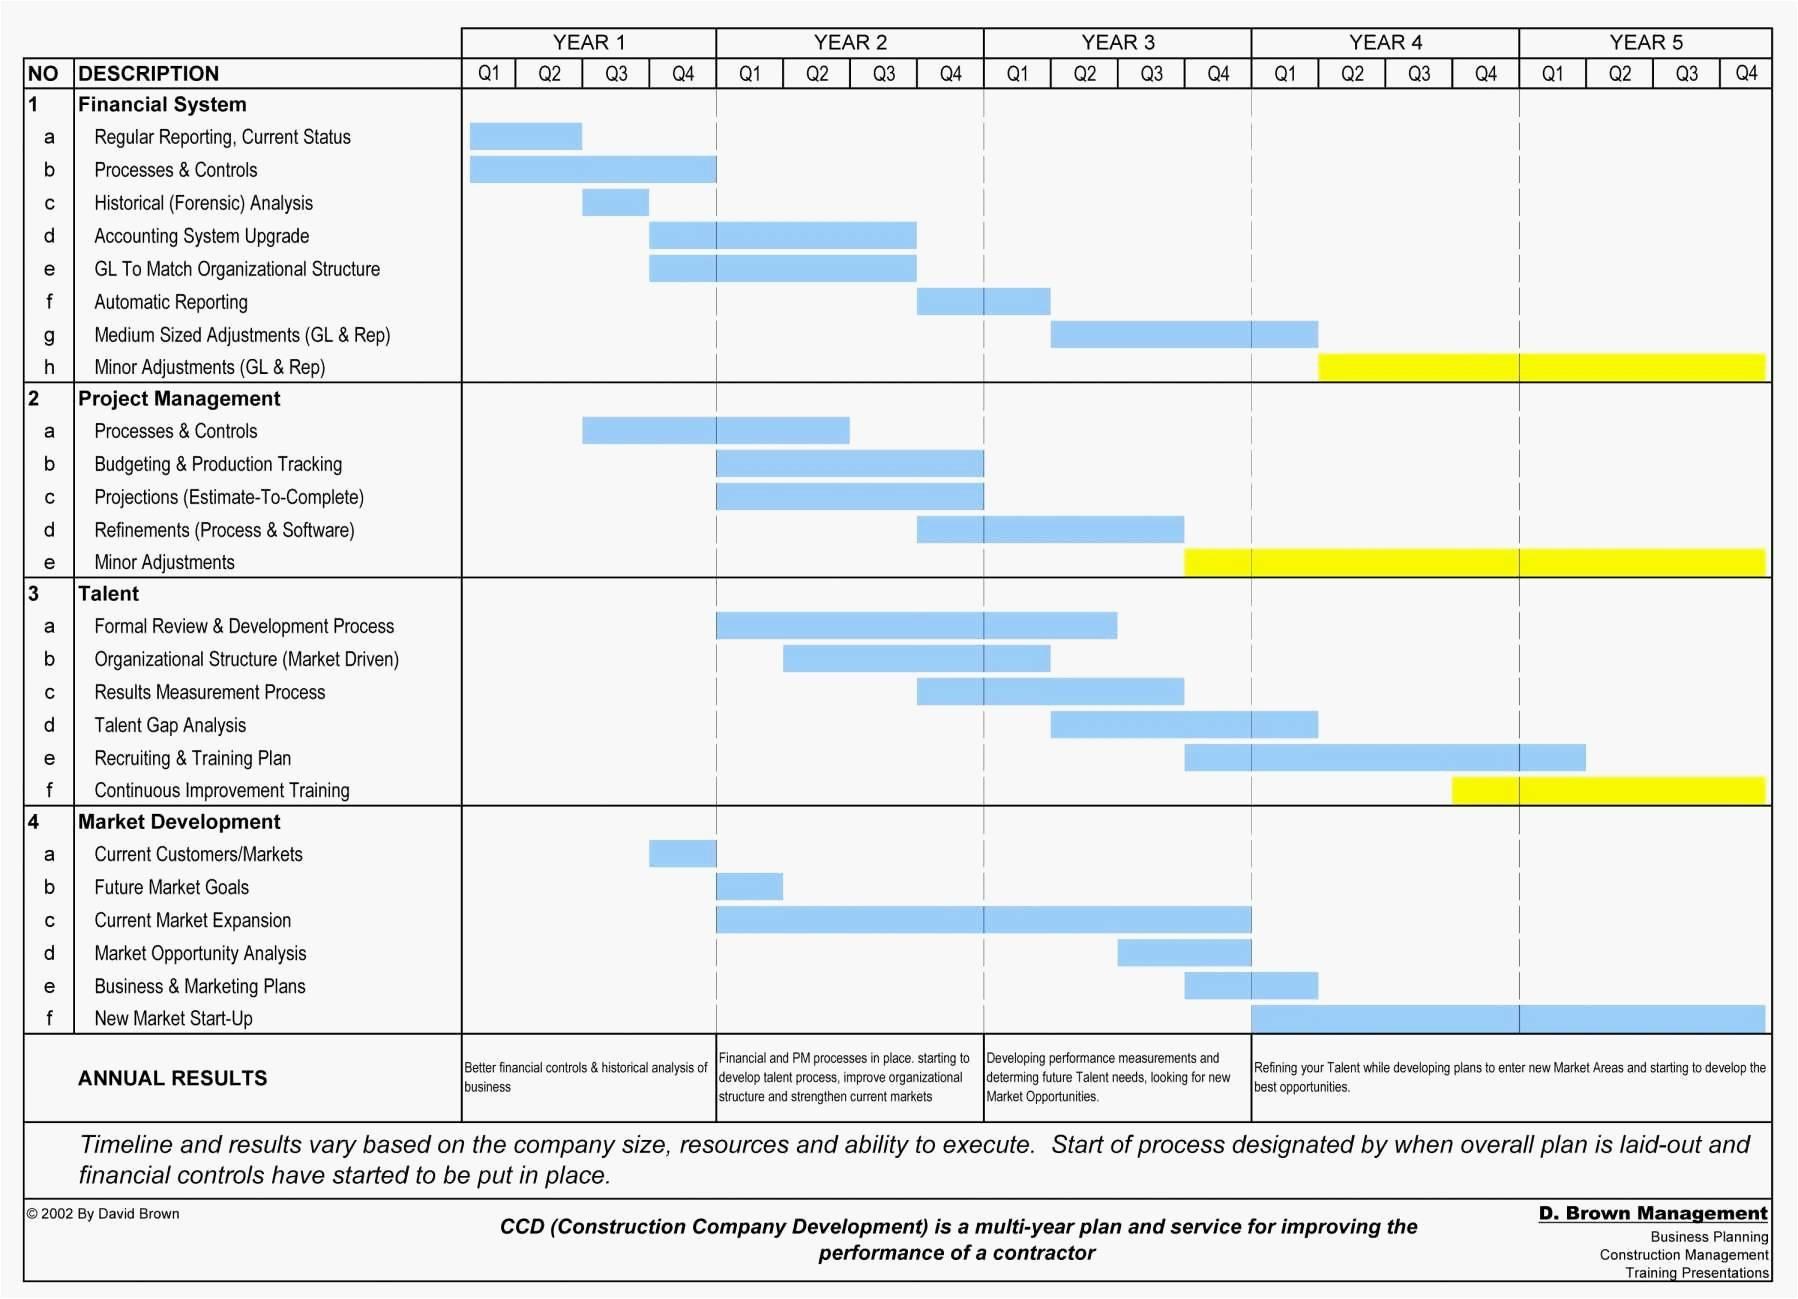 Job Management Spreadsheet Throughout Job Tracking Spreadsheet – Spreadsheet Collections Job Management Spreadsheet Google Spreadshee Google Spreadshee job management spreadsheet